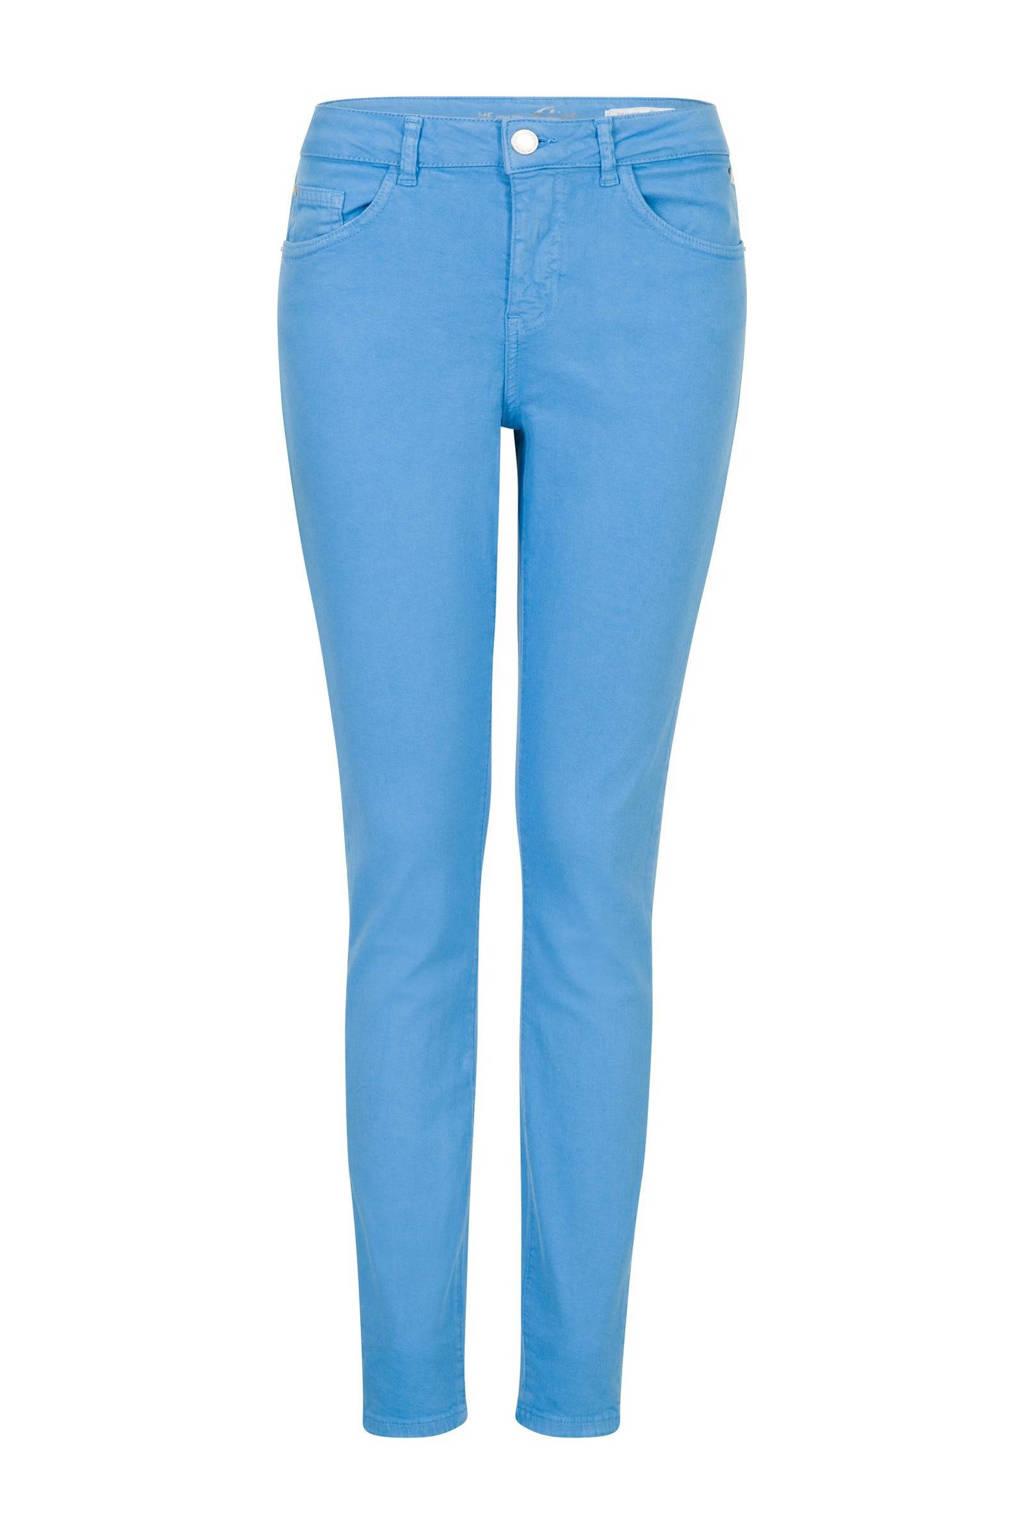 Miss Etam Regulier skinny broek blauw, Blauw